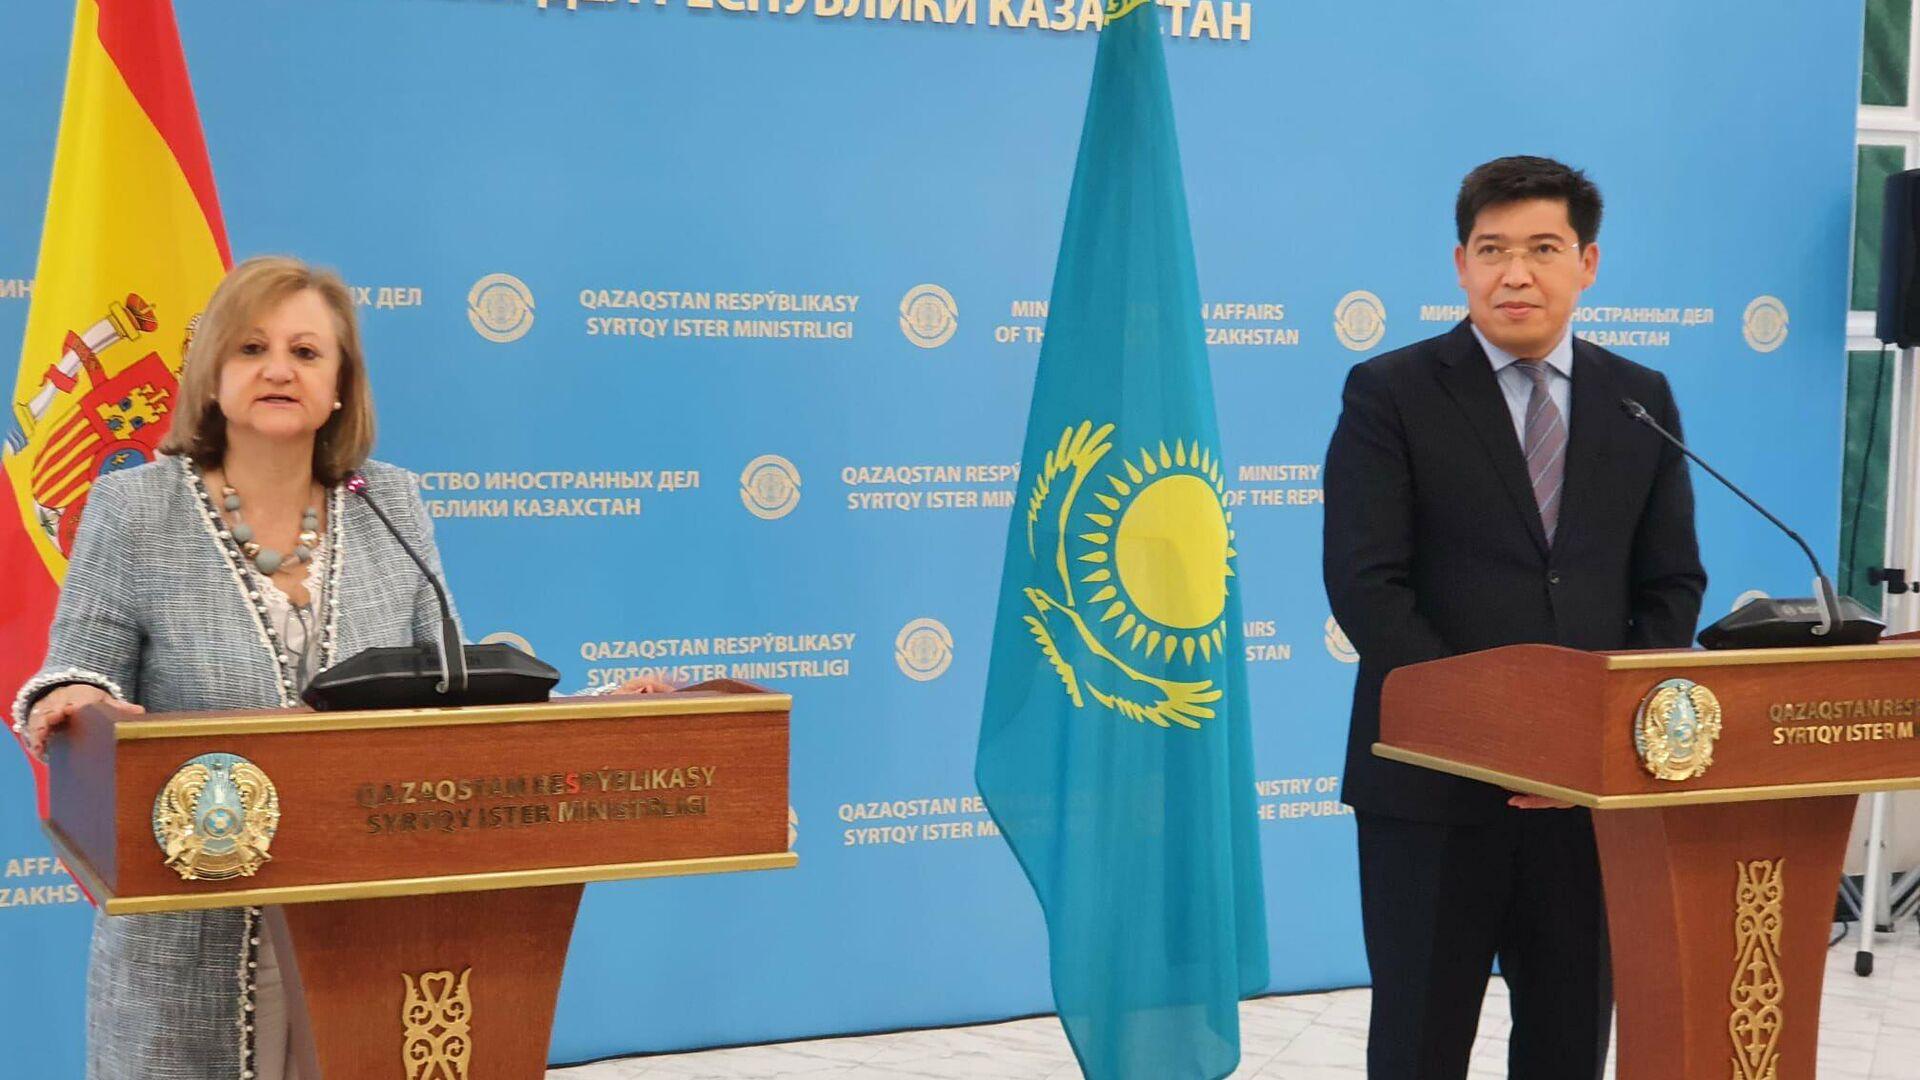 Cristina Gallach, la Secretaria de Estado de Asuntos Exteriores de España, con el viceministro de Exteriores kazajo, Yerlan Alimbayev - Sputnik Mundo, 1920, 14.05.2021